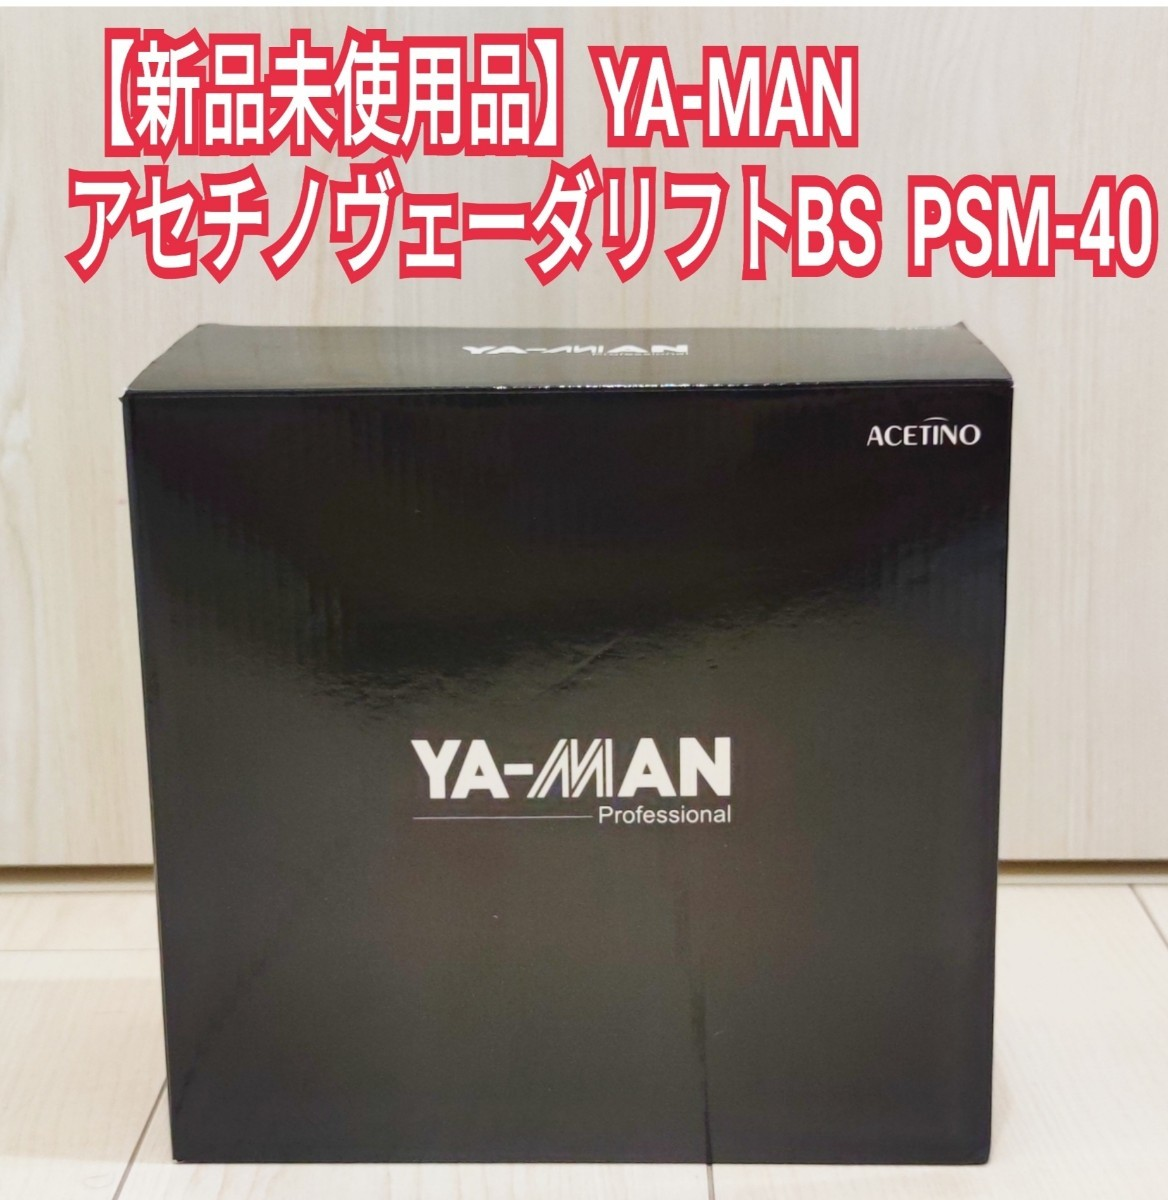 YA-MAN ヤーマン アセチノヴェーダリフトBS  PSM-40